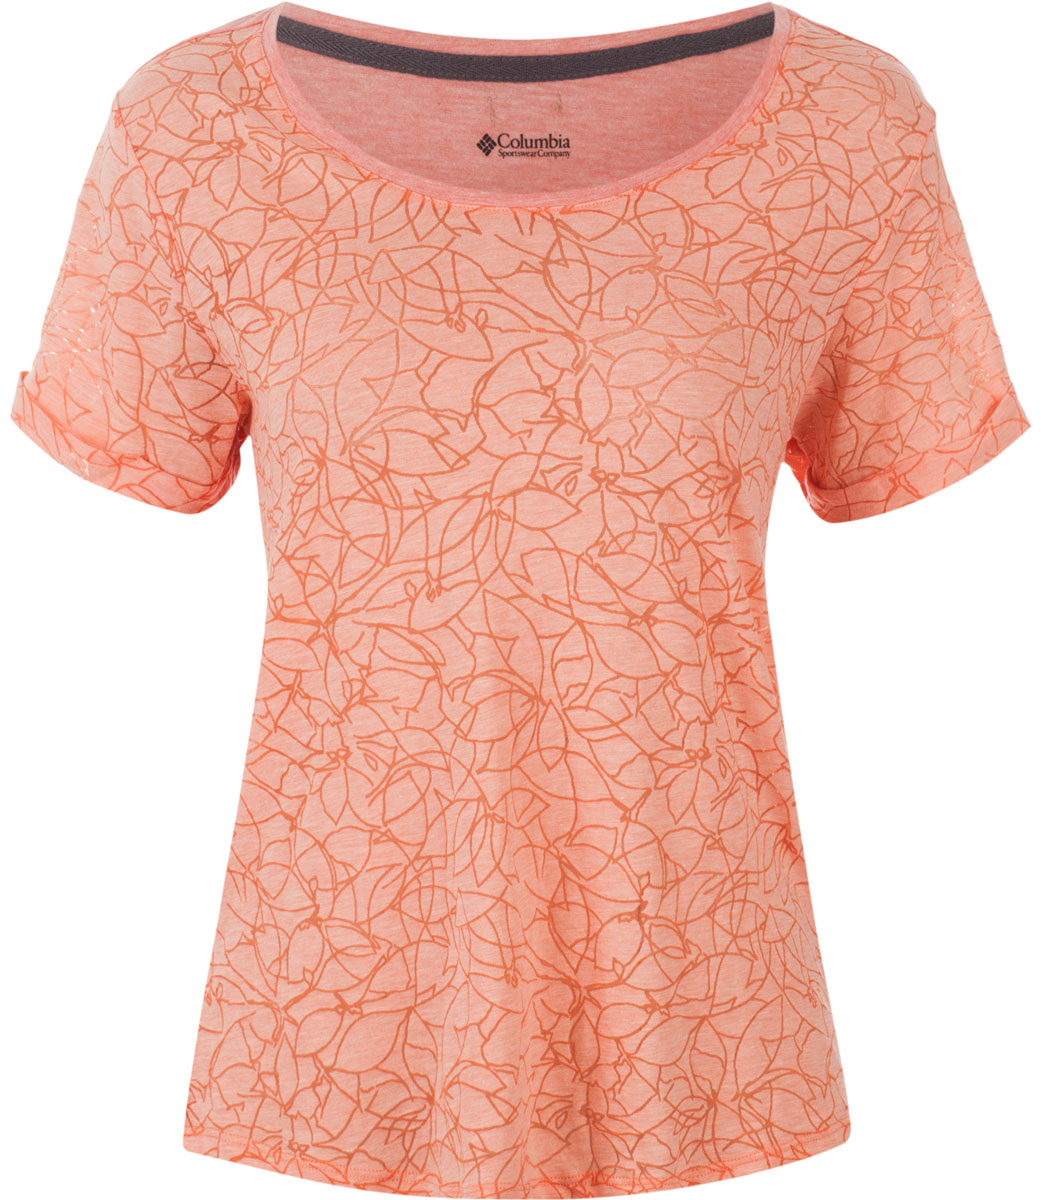 Футболка женская Columbia Sandy River Tee T-shirt, цвет: оранжевый. 1712031-867. Размер XS (42) платки seanna платок шифон морозный узор